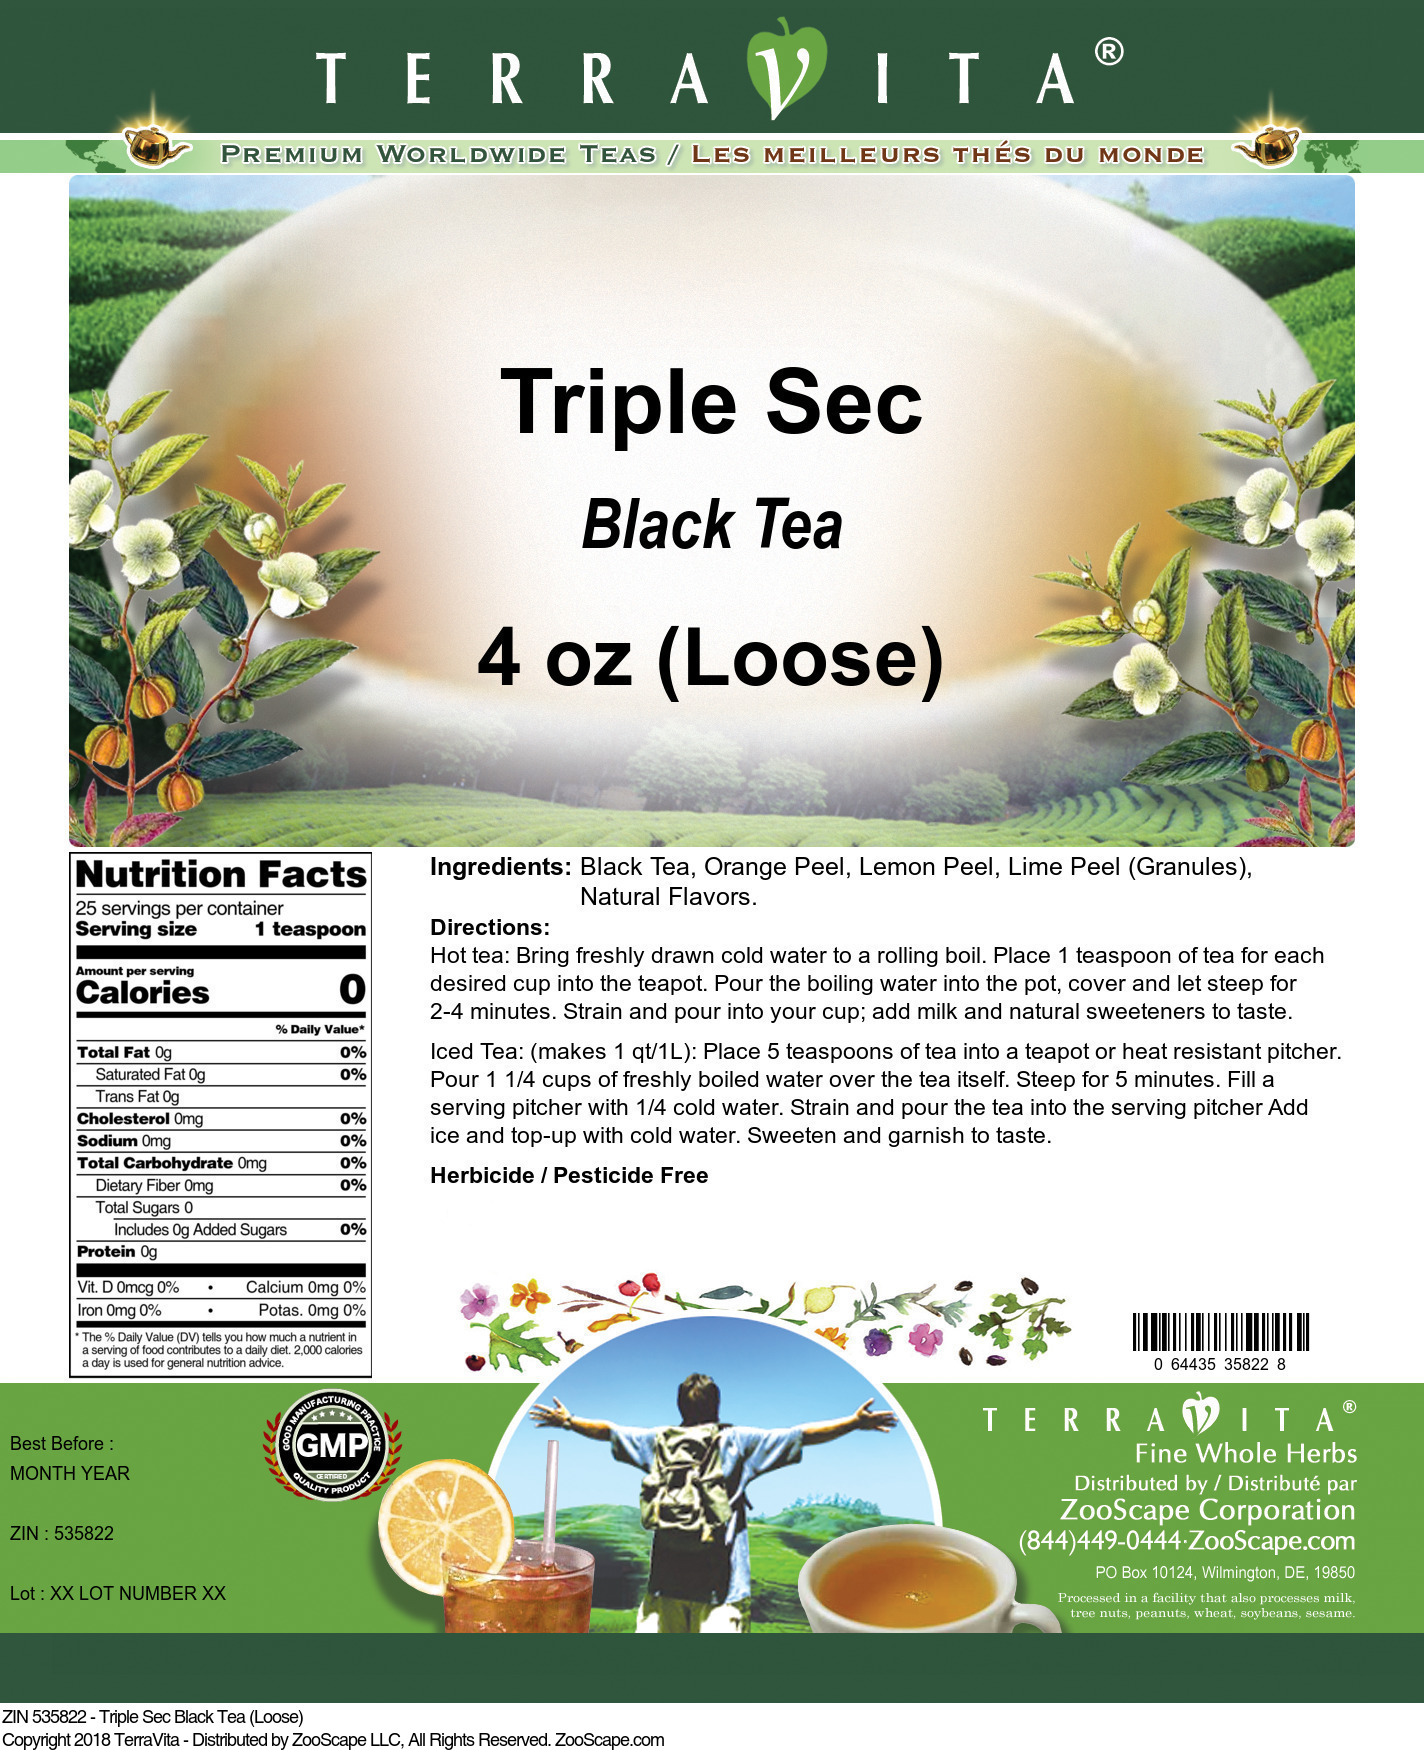 Triple Sec Black Tea